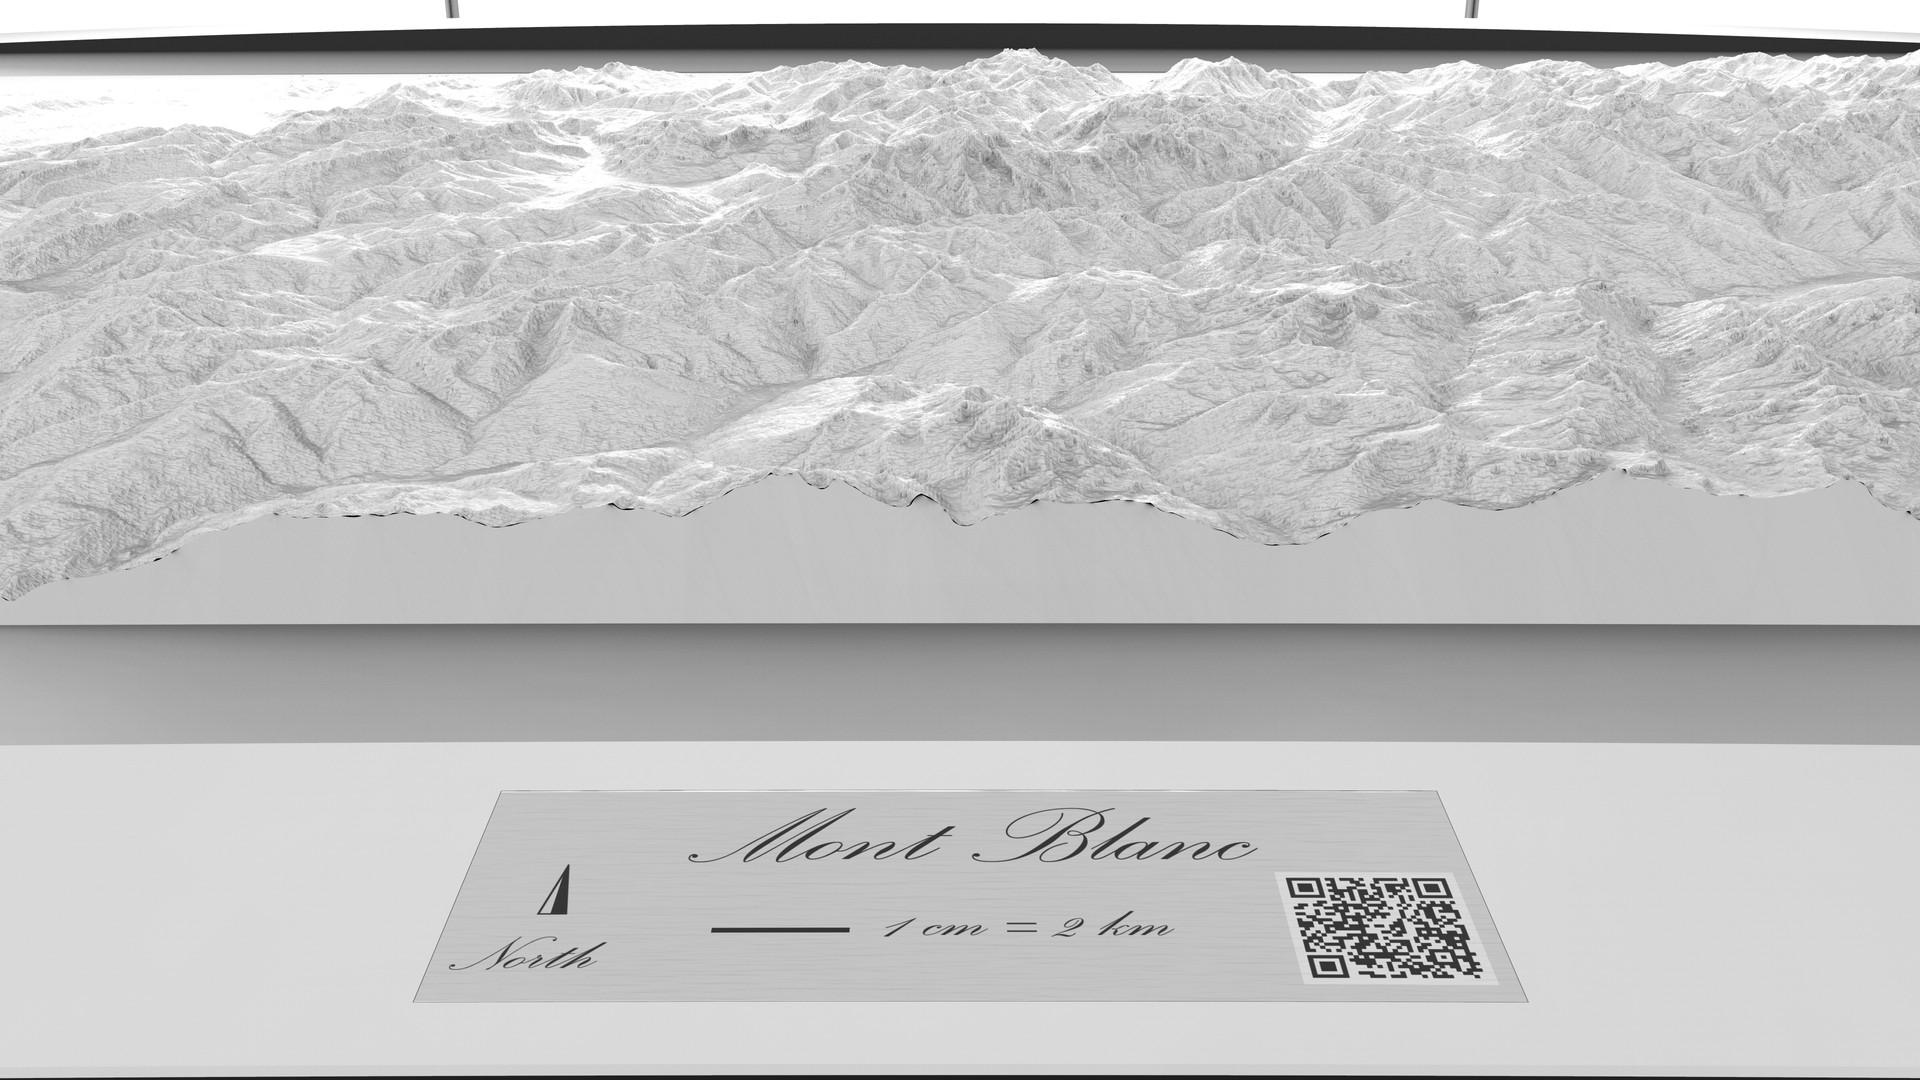 Mont Blanc.78.jpg